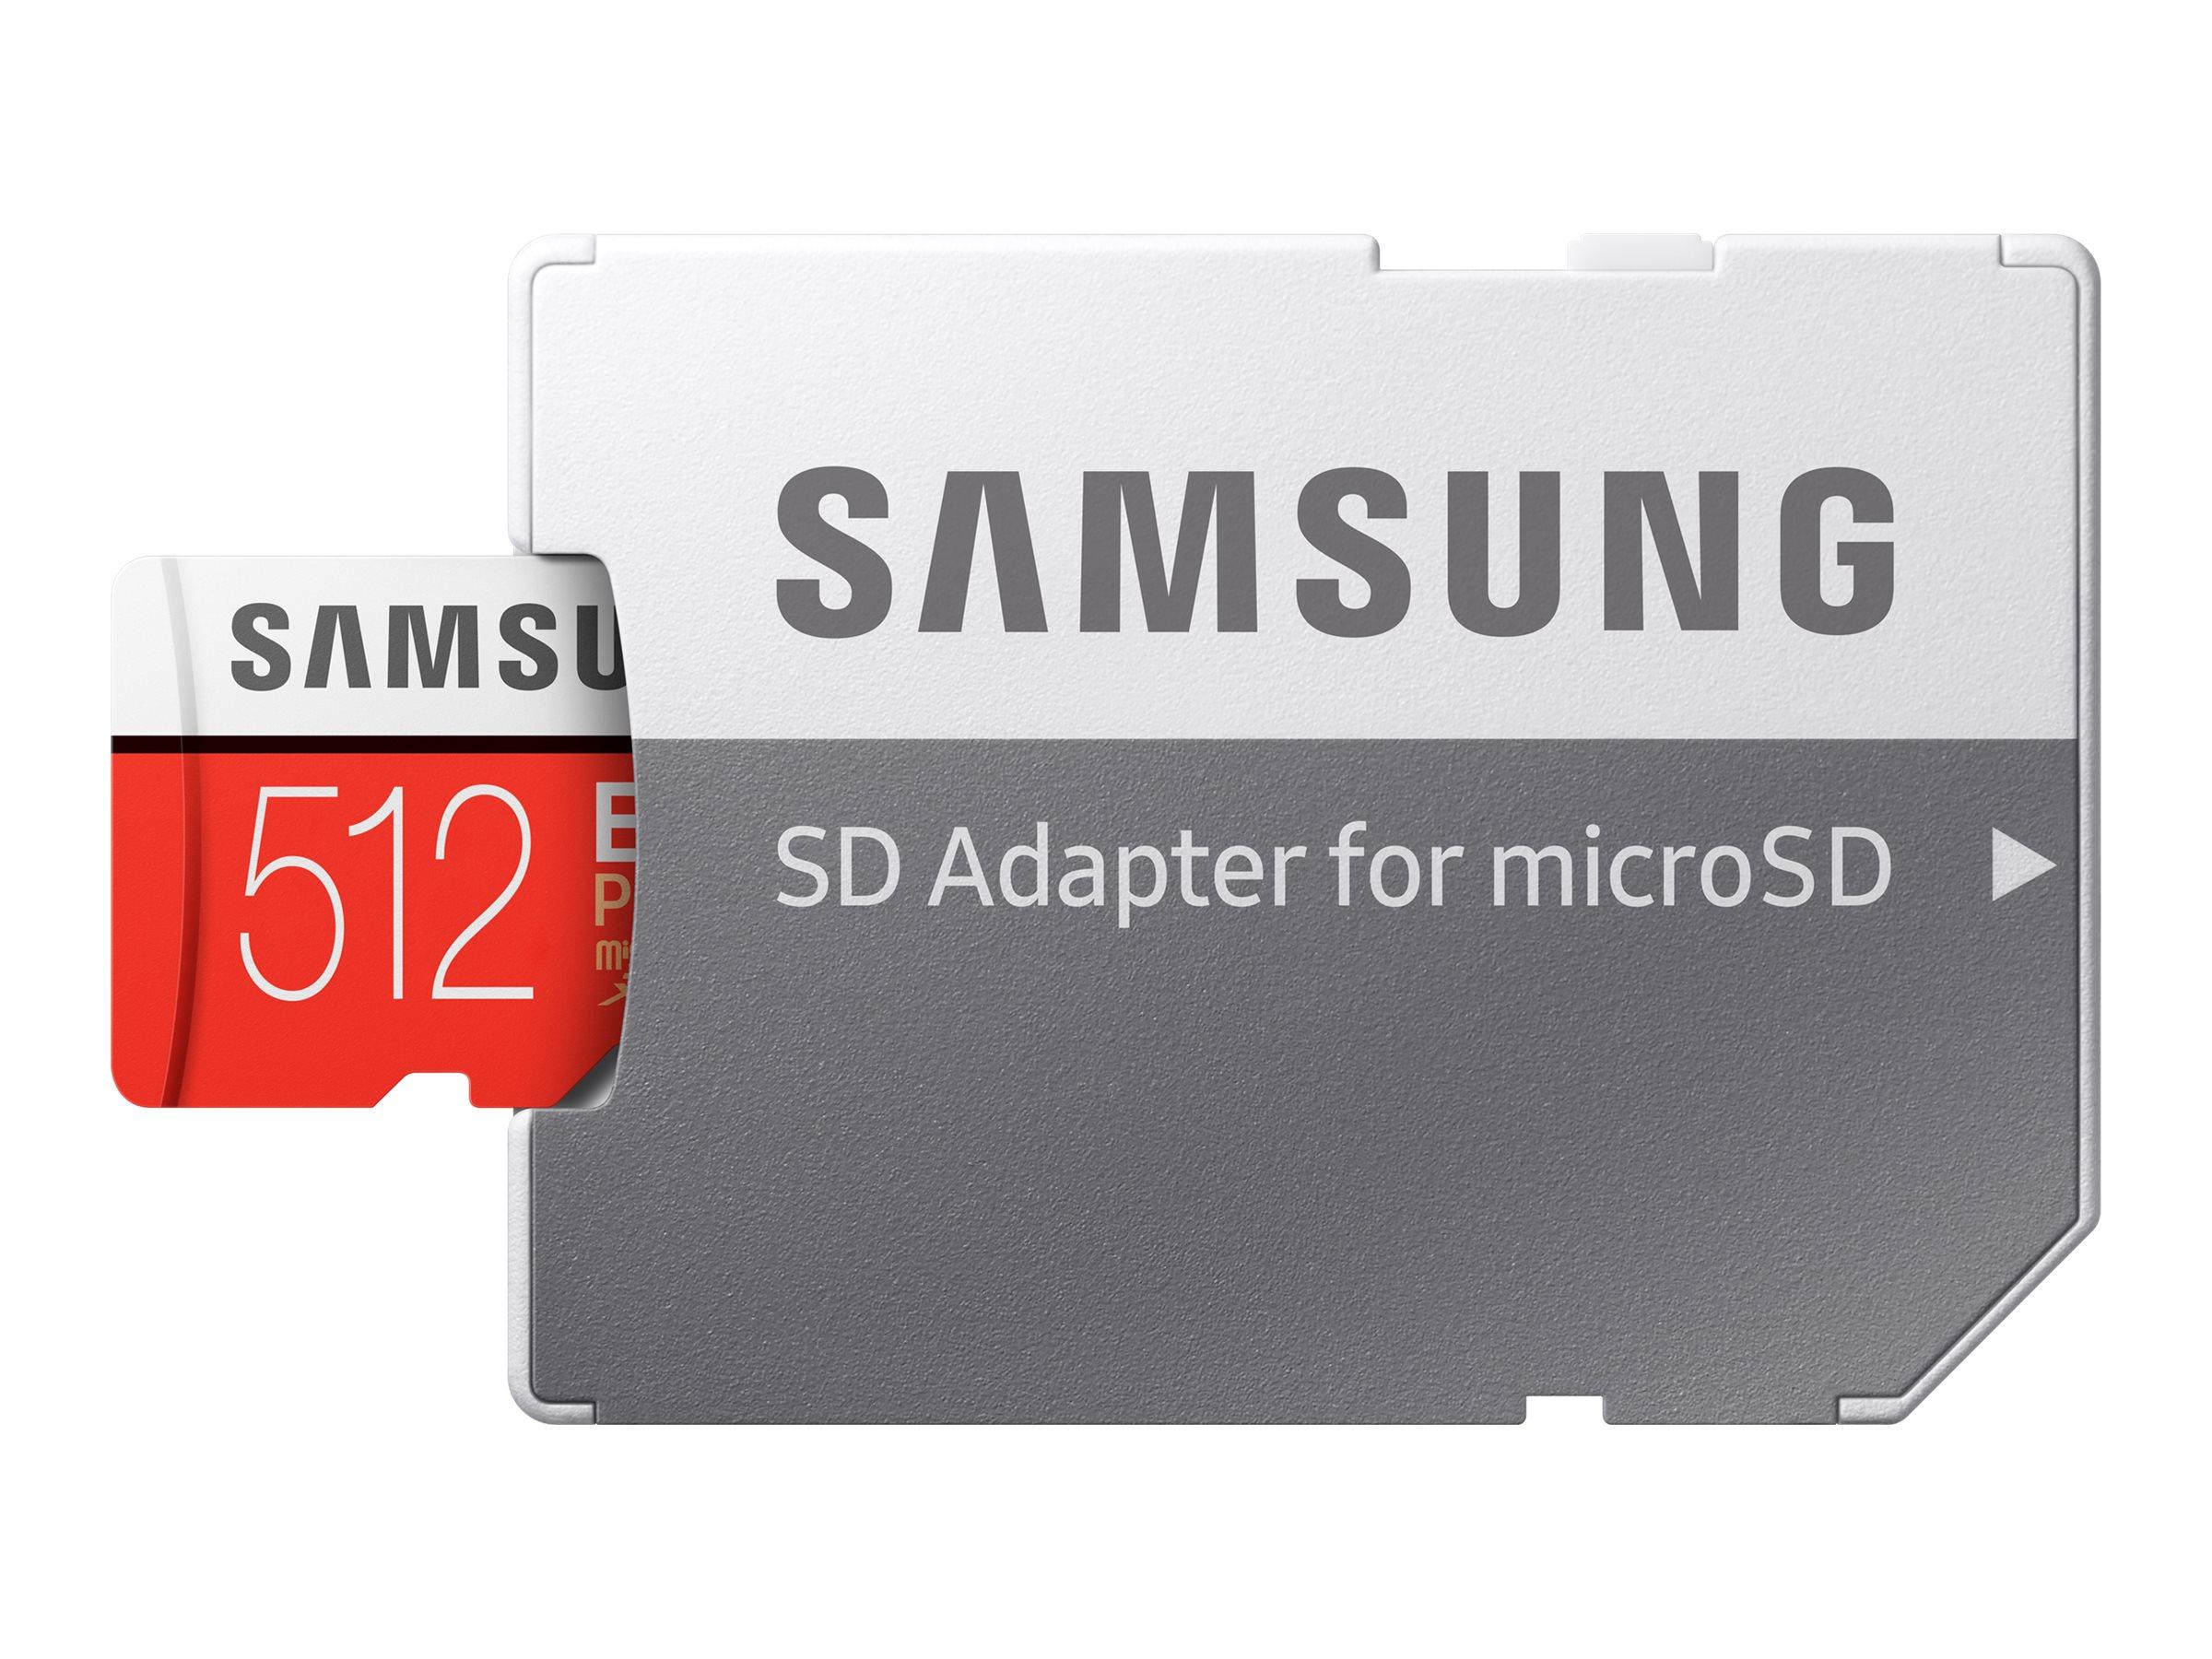 Samsung EVO Plus MB-MC512HA - Flash-Speicherkarte (microSDXC-an-SD-Adapter inbegriffen) - 512 GB - UHS-I U3 / Class10 - microSDX